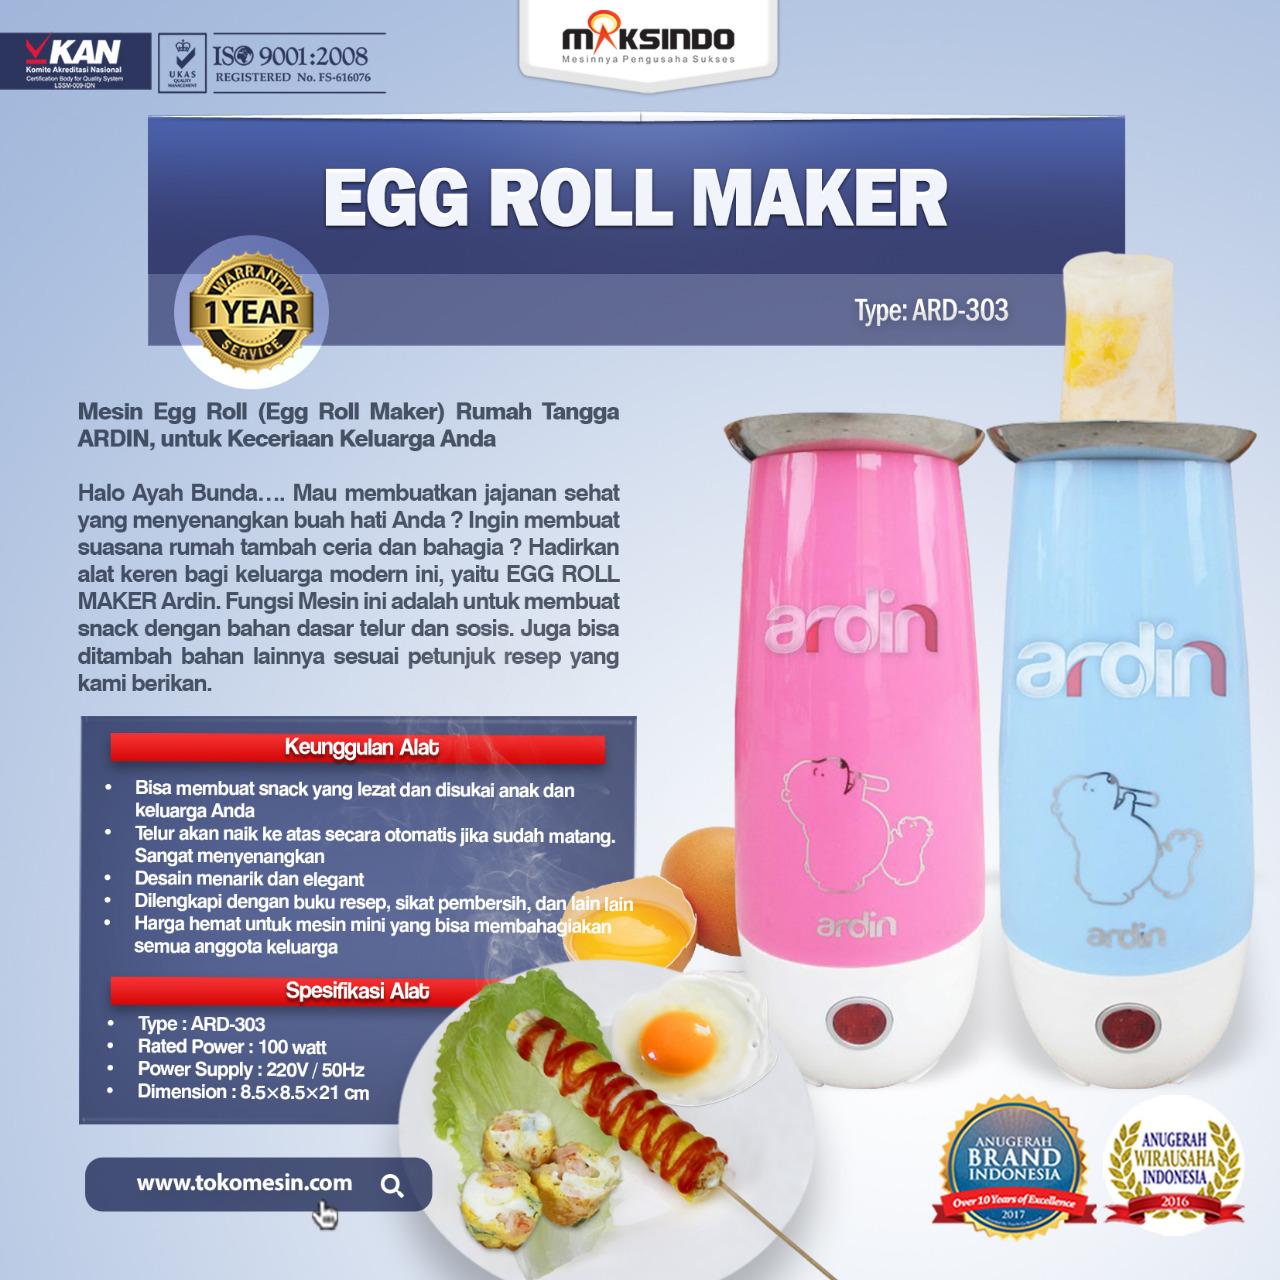 Jual Egg Roll Maker (ARD-303) di Tangerang